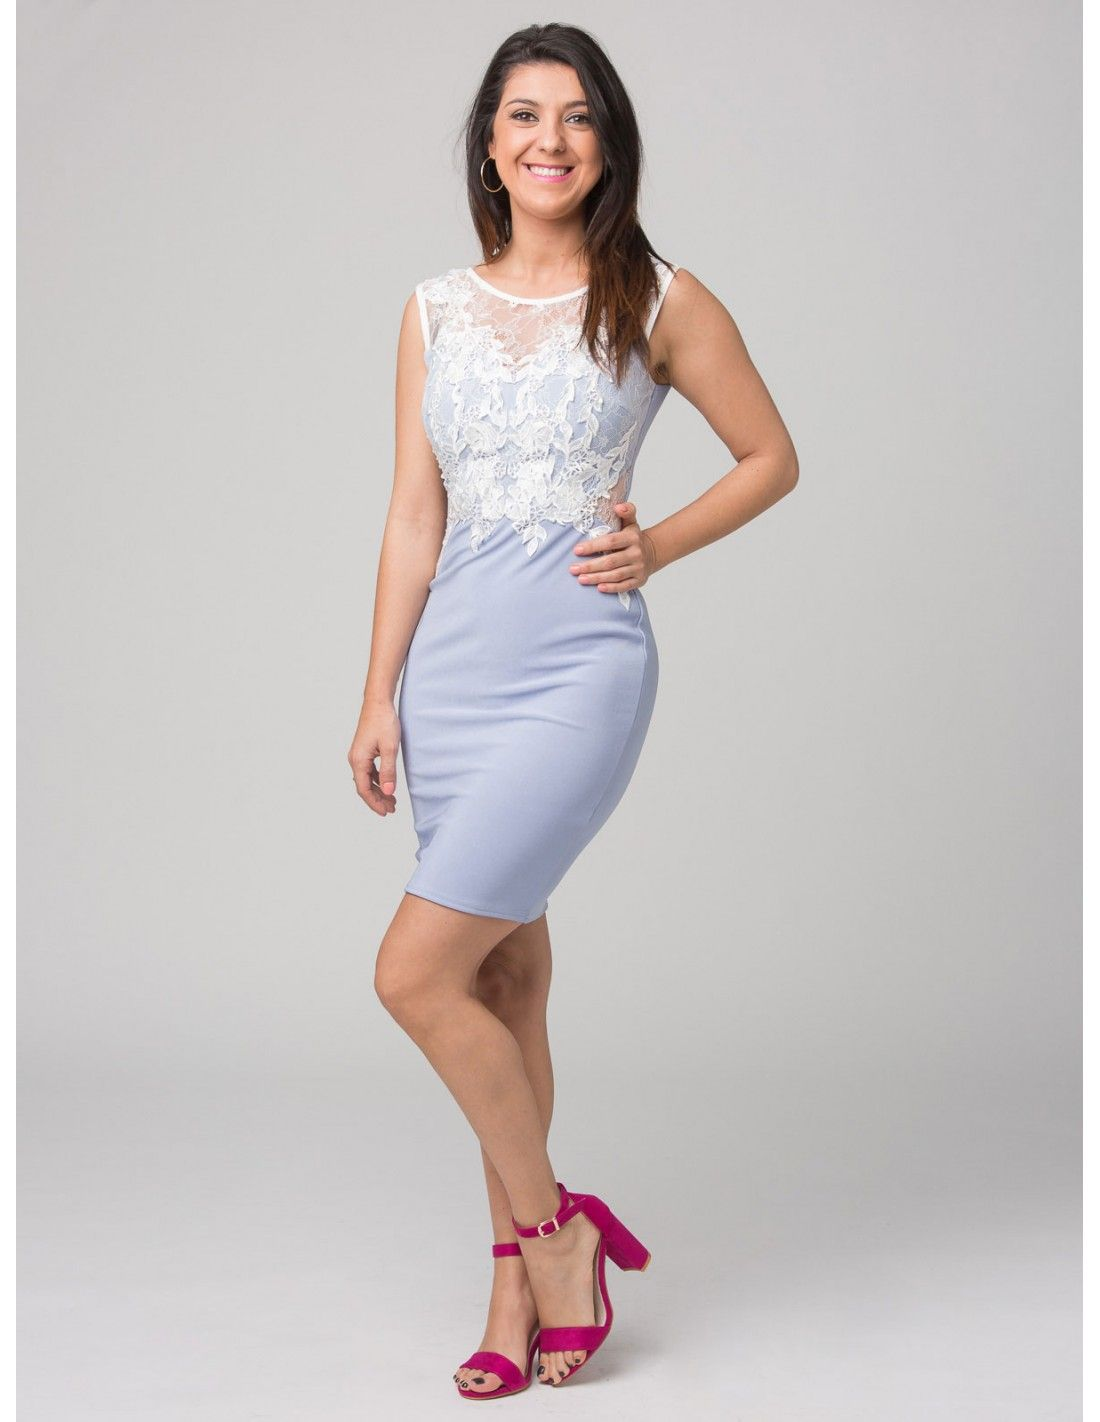 Vestido Gabi  Lipsy London - Vestido elástico de tubo en color celeste.  Detalle de cc9308b09d7a